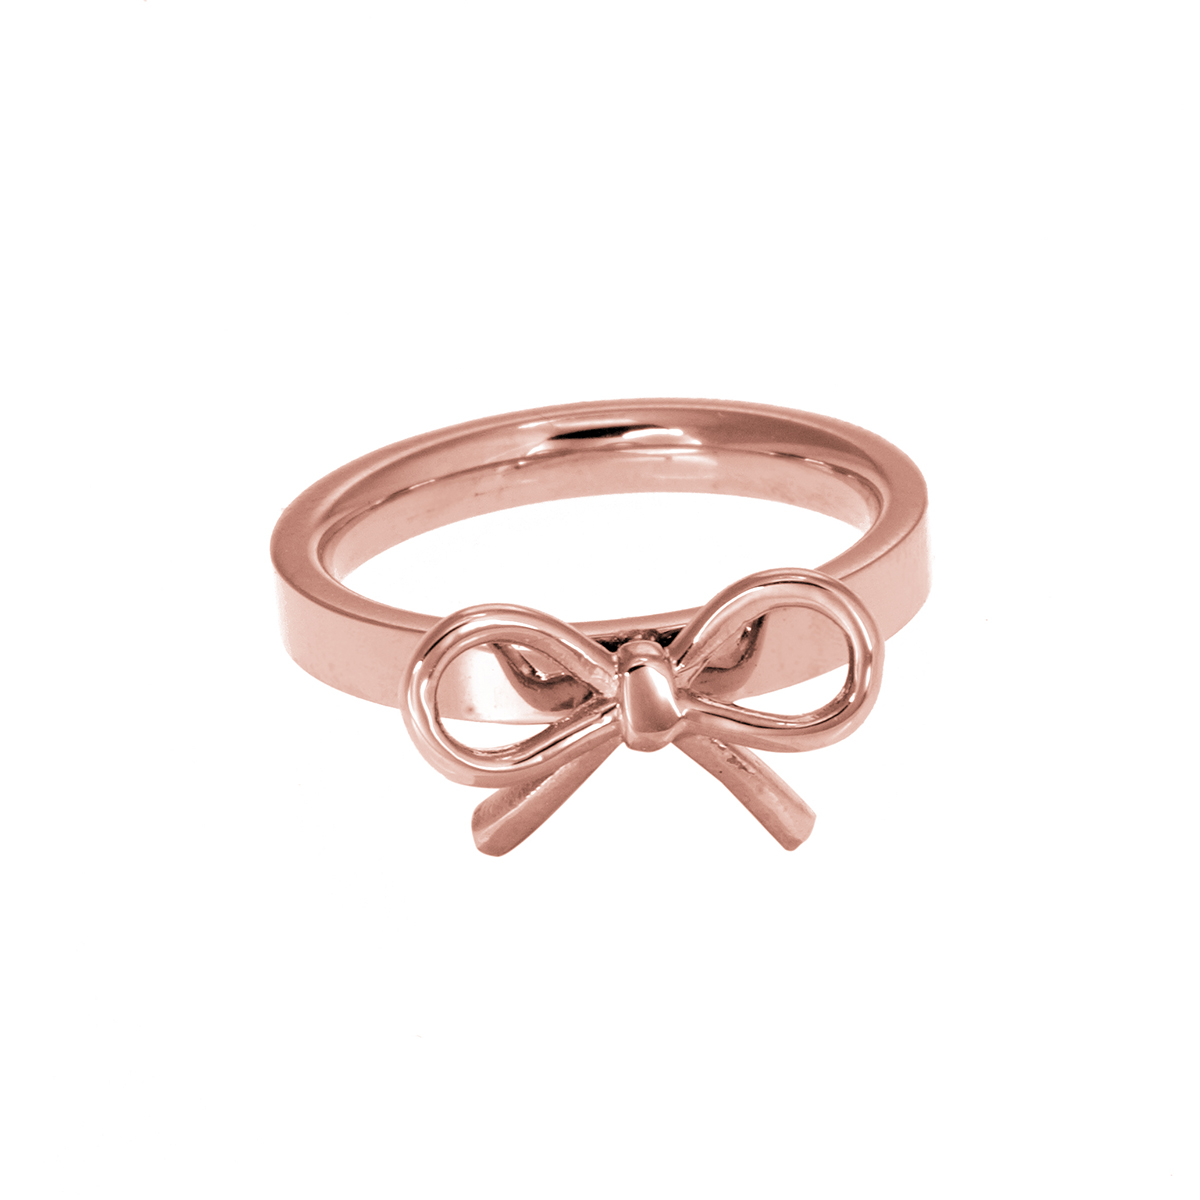 Ingnell Jewellery – Molly ring, rosé (Ringstorlek: 18 mm)